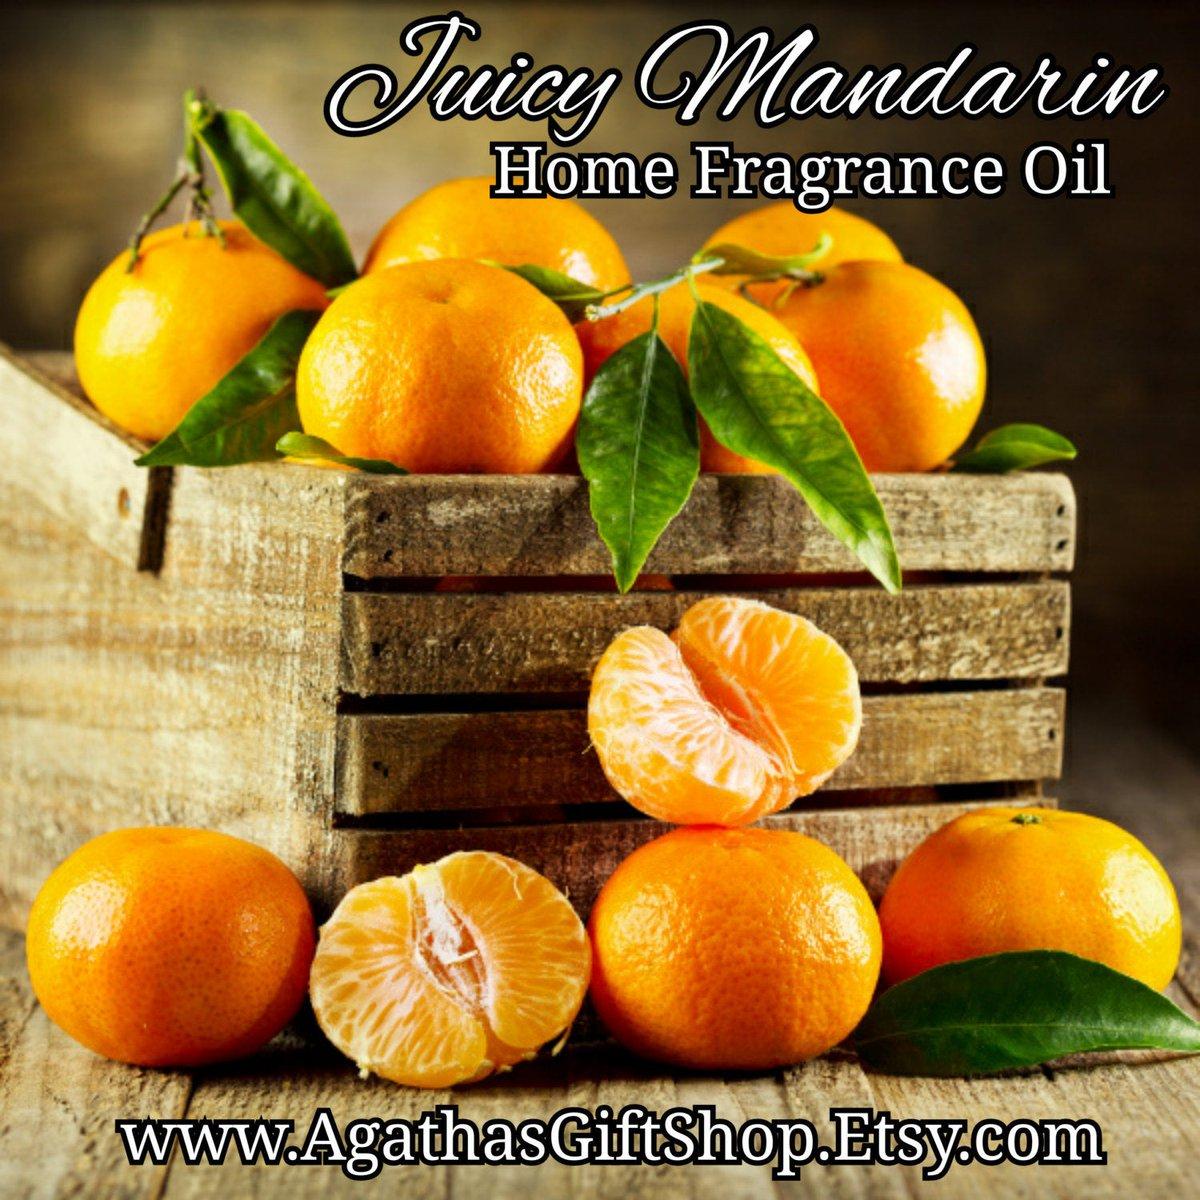 Juicy Mandarin Home Fragrance Diffuser Warmer Aromatherapy Burning Oil  #CyberMonday #BlackFriday #Wedding #Etsy #PerfumeBodyOils #AromatherapyOil #HerbalRemedies #Incense #GiftShopSale #HomeFragranceOil #JuicyMandarin